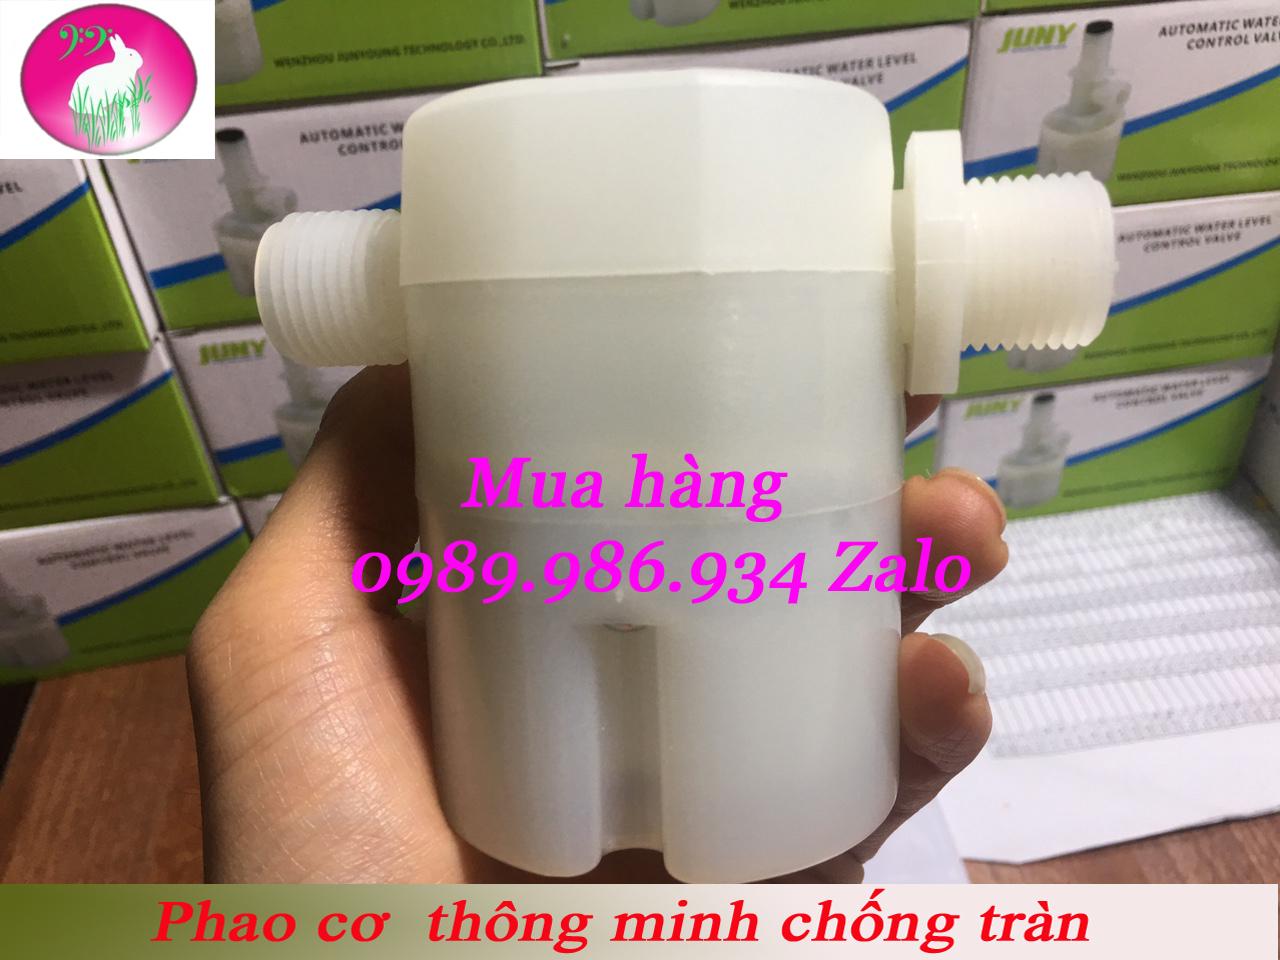 phao-co-chong-tran-jpg.45039